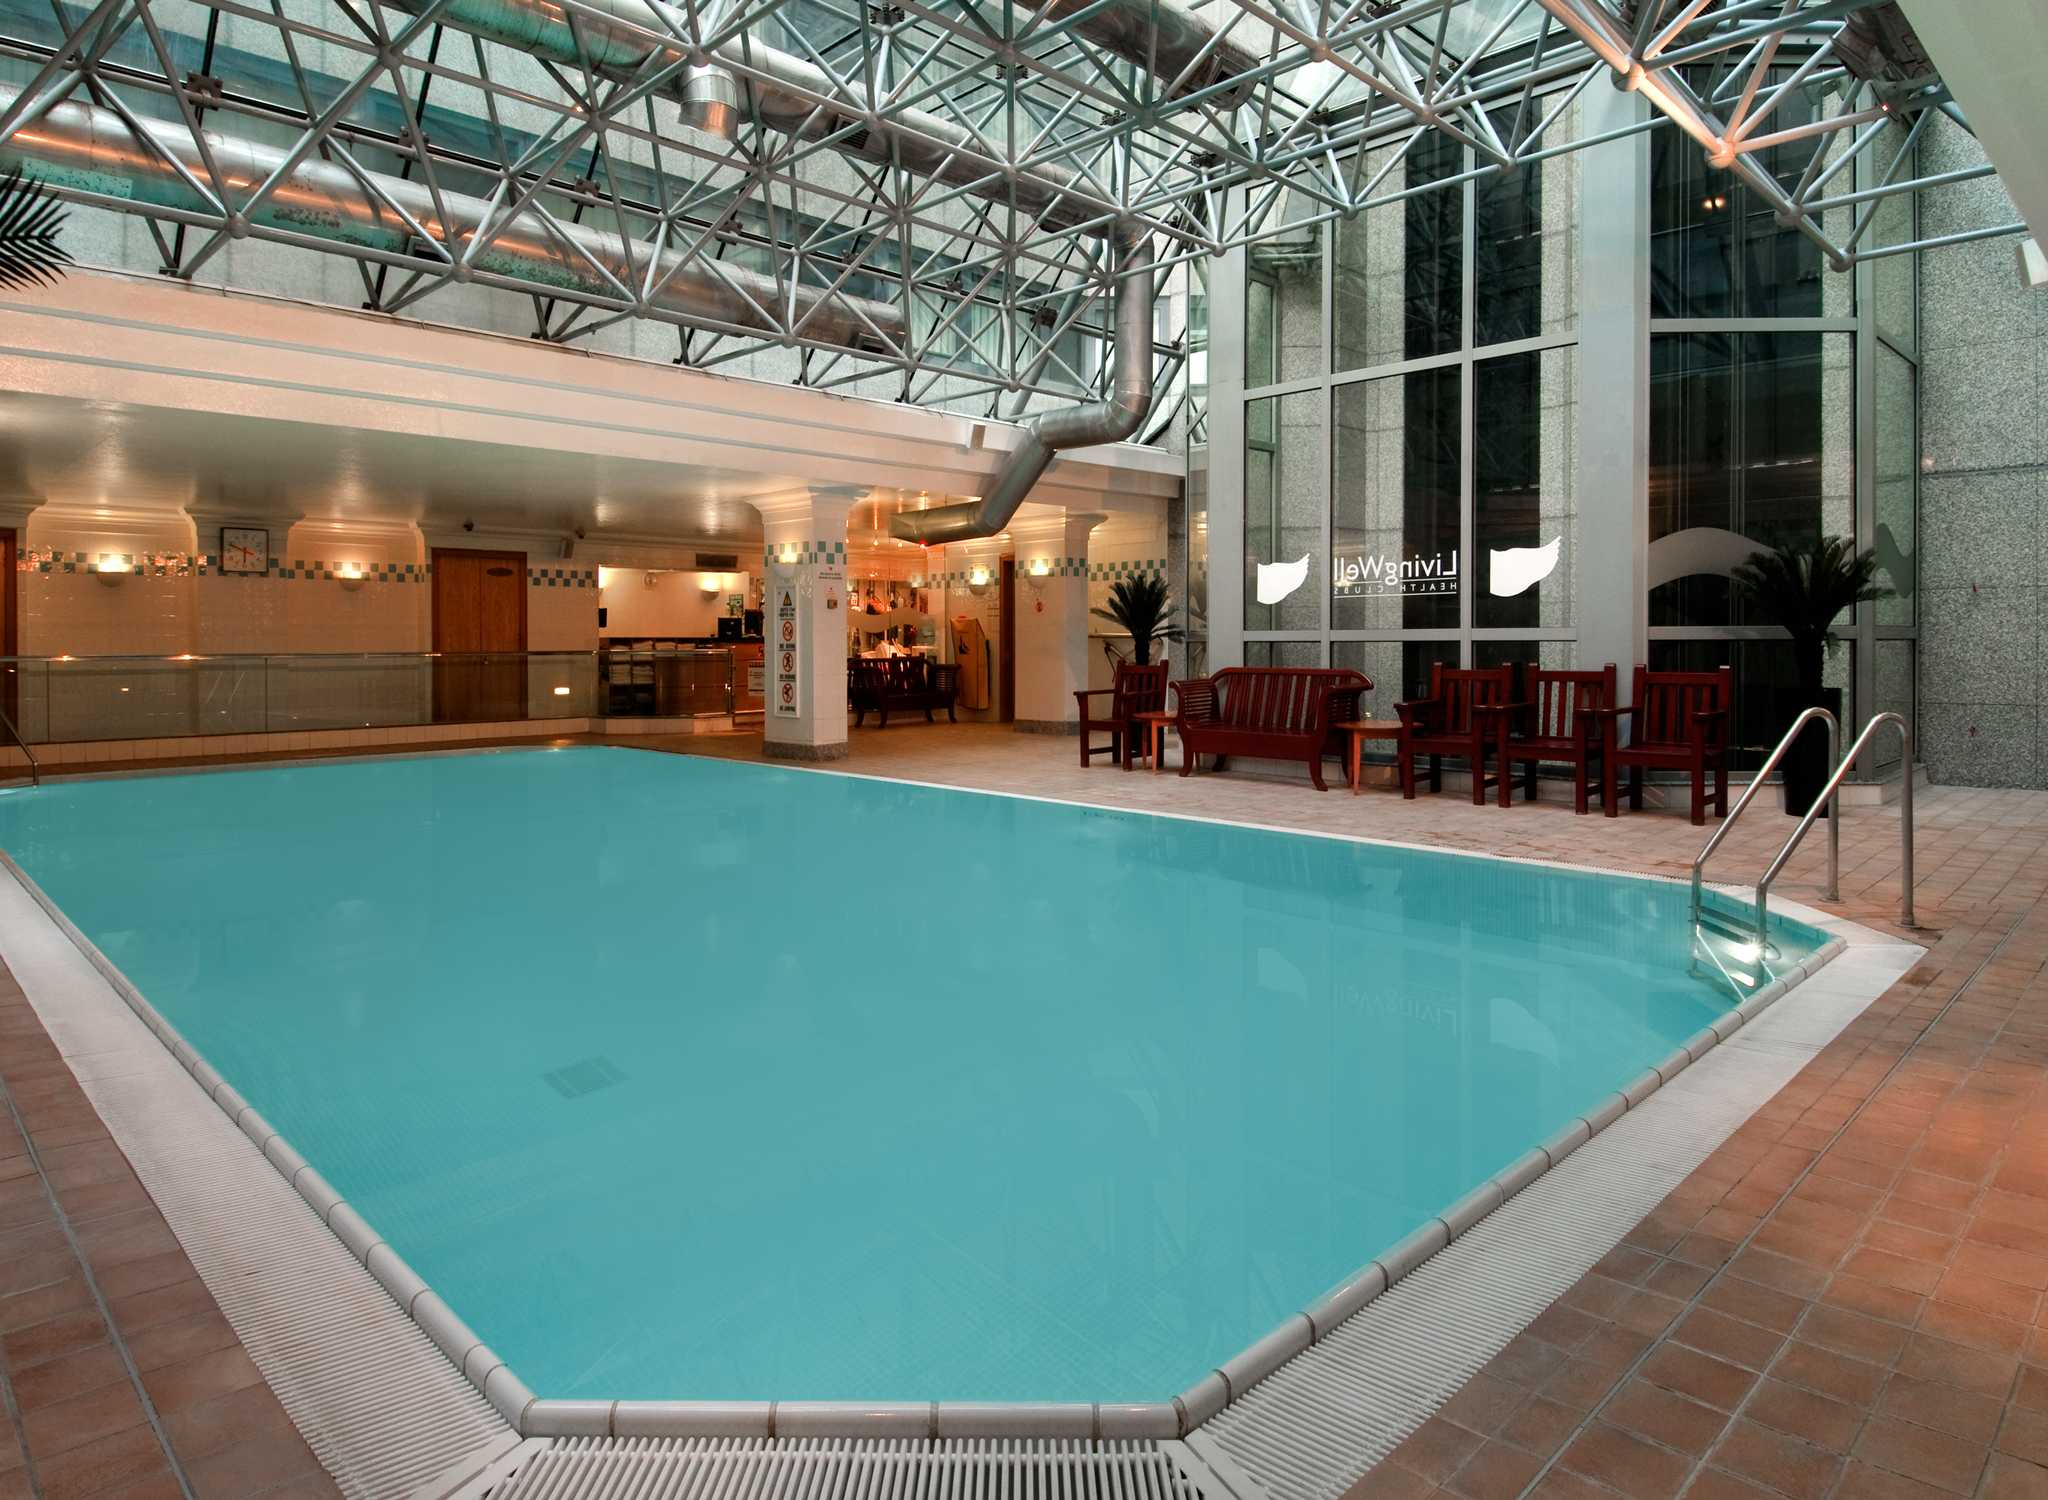 hoteller i london storbritannien